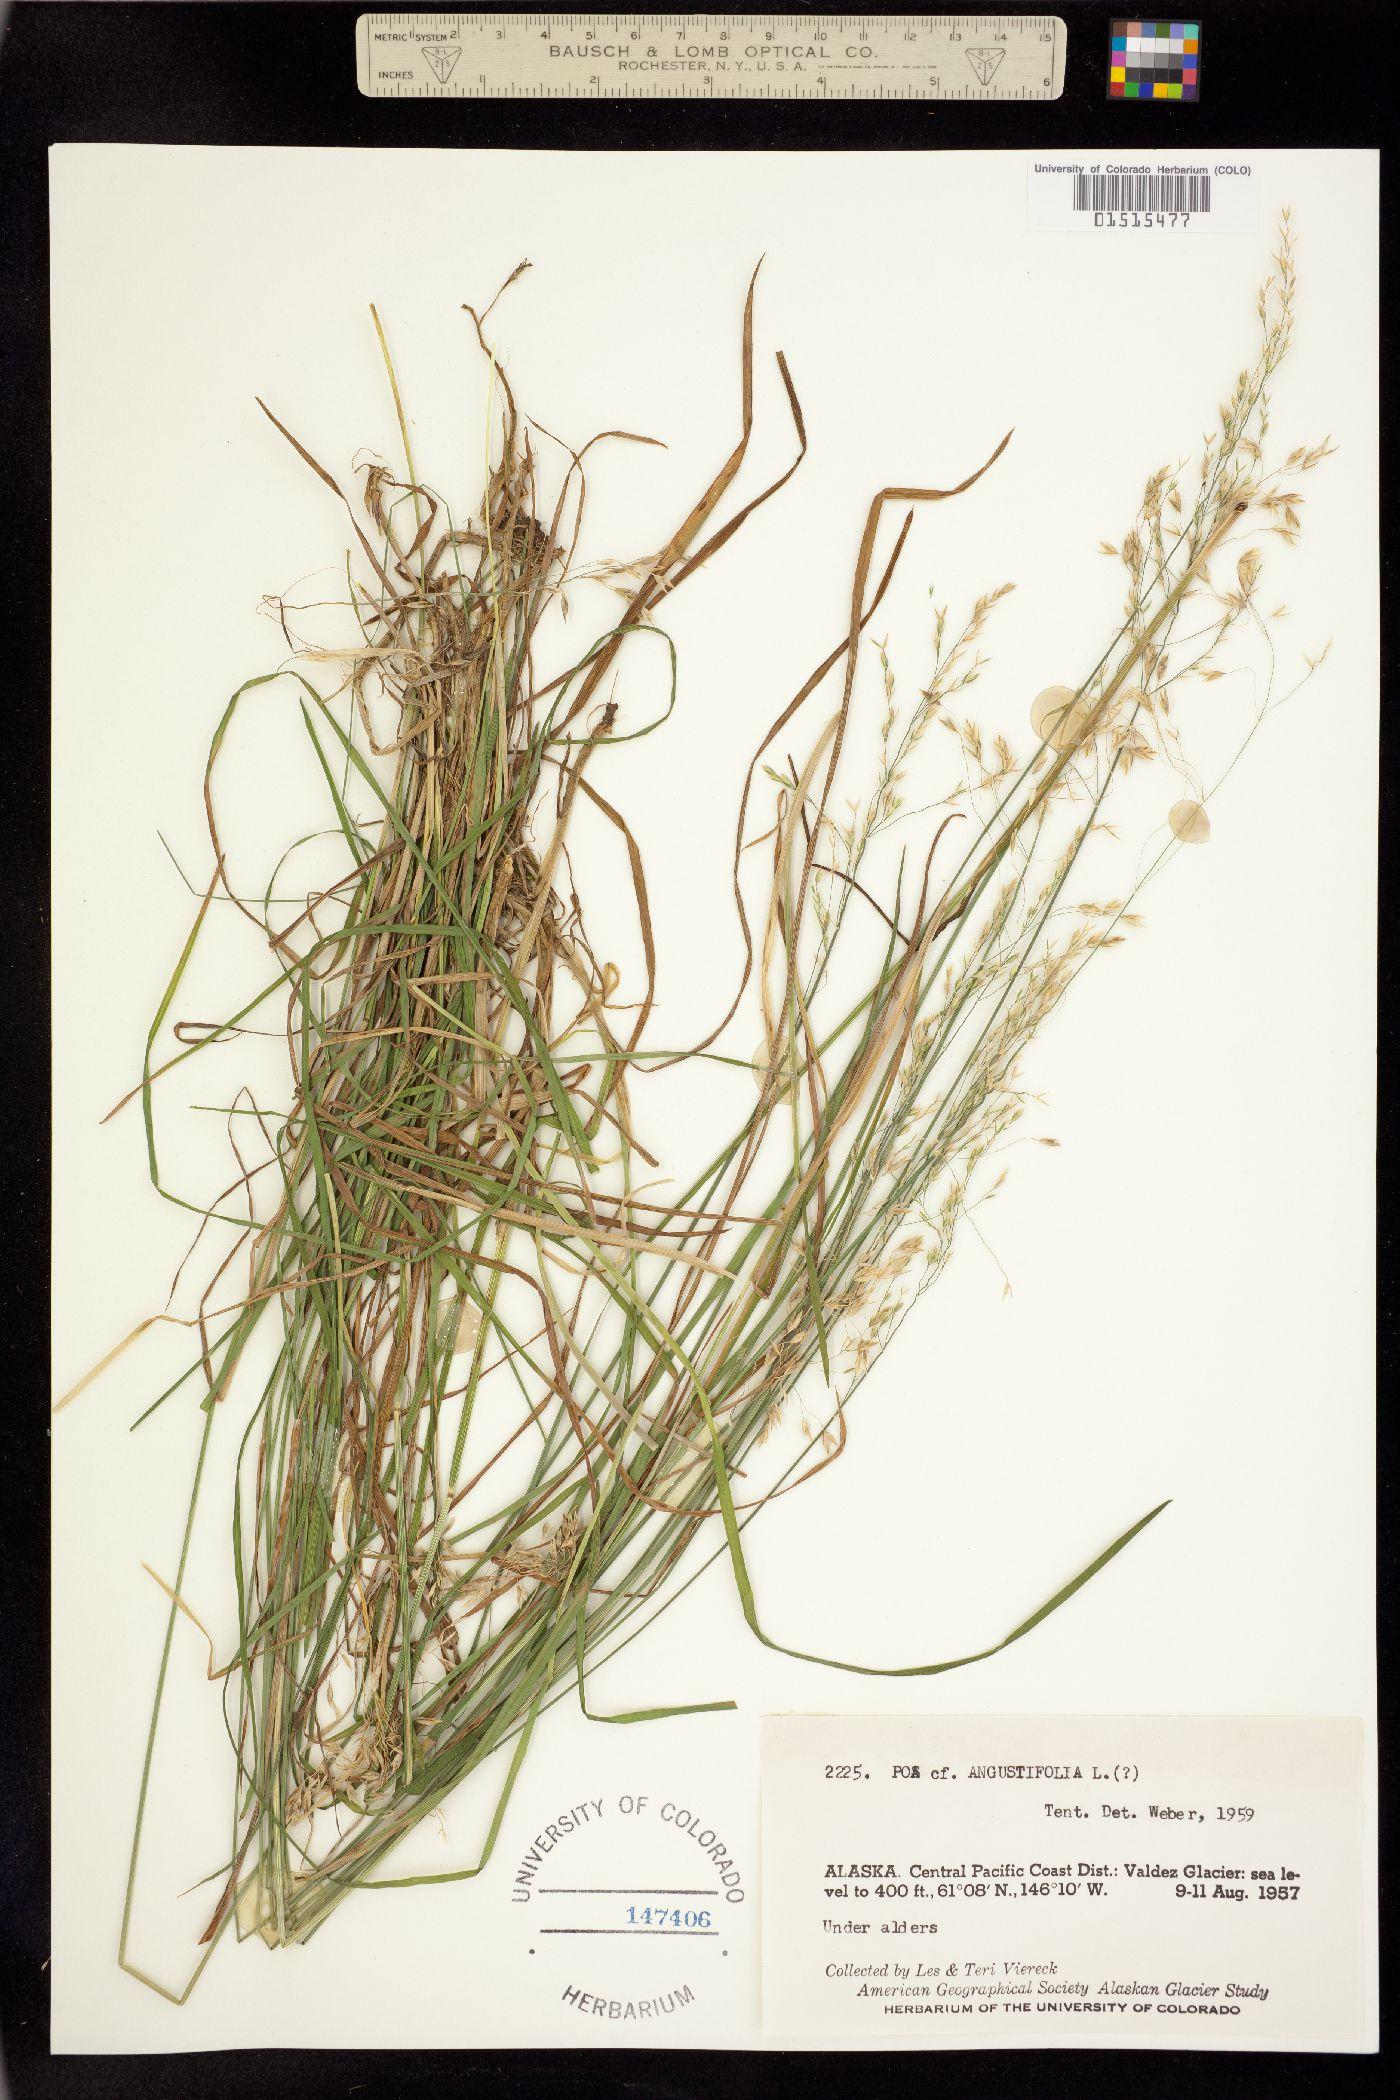 Poa angustifolia image